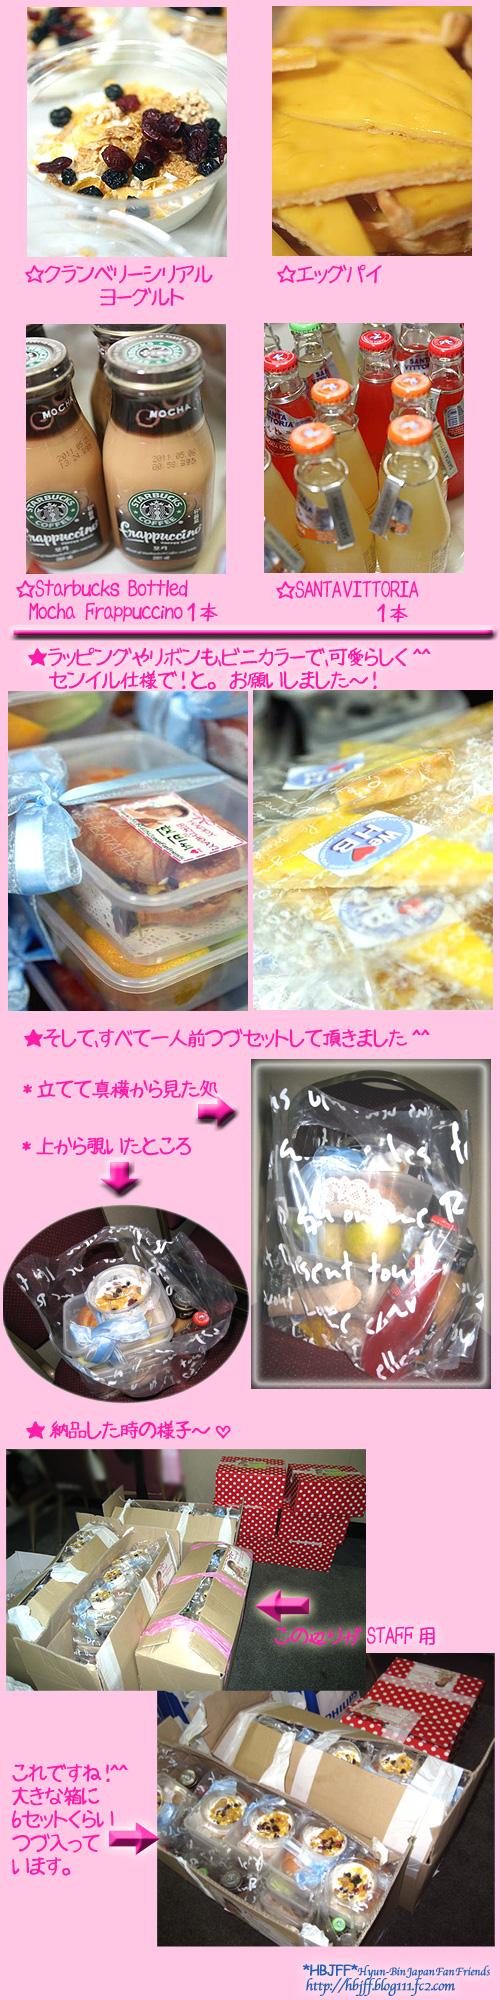 20100925staff_lunch02